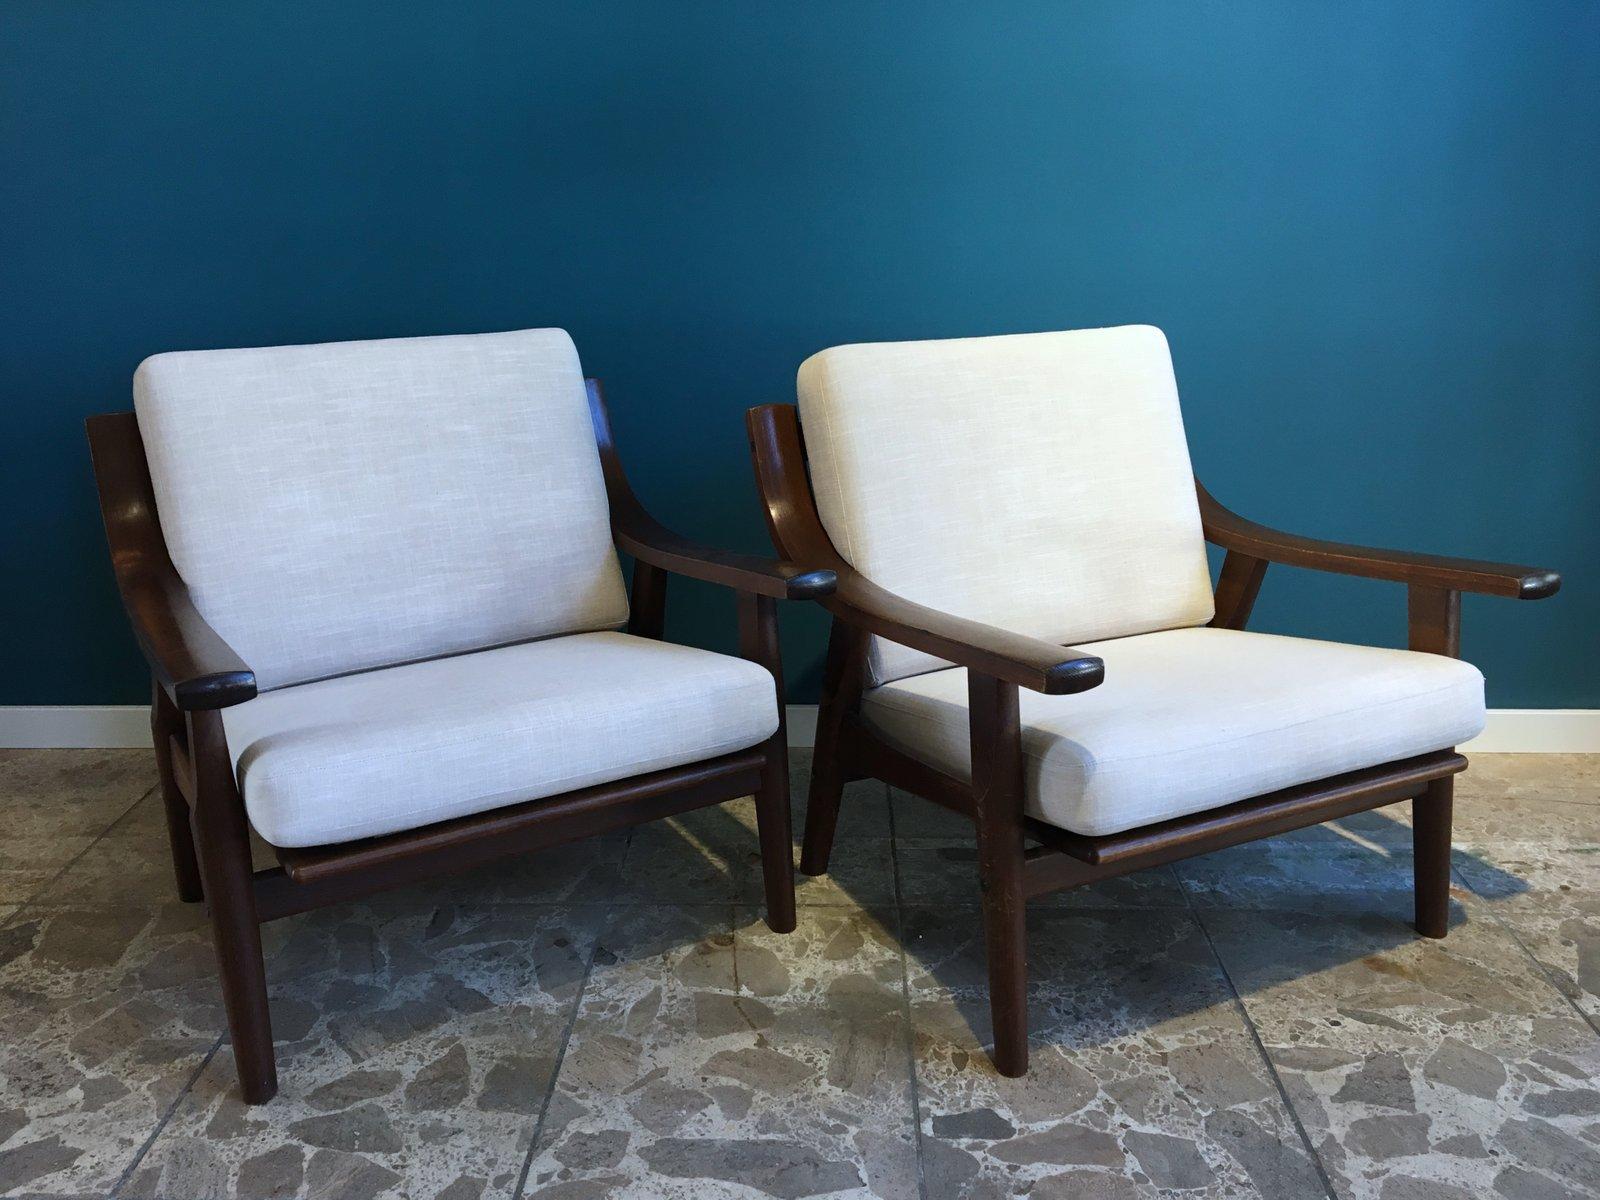 eiche ge530 sessel von hans j wegner f r getama bei. Black Bedroom Furniture Sets. Home Design Ideas